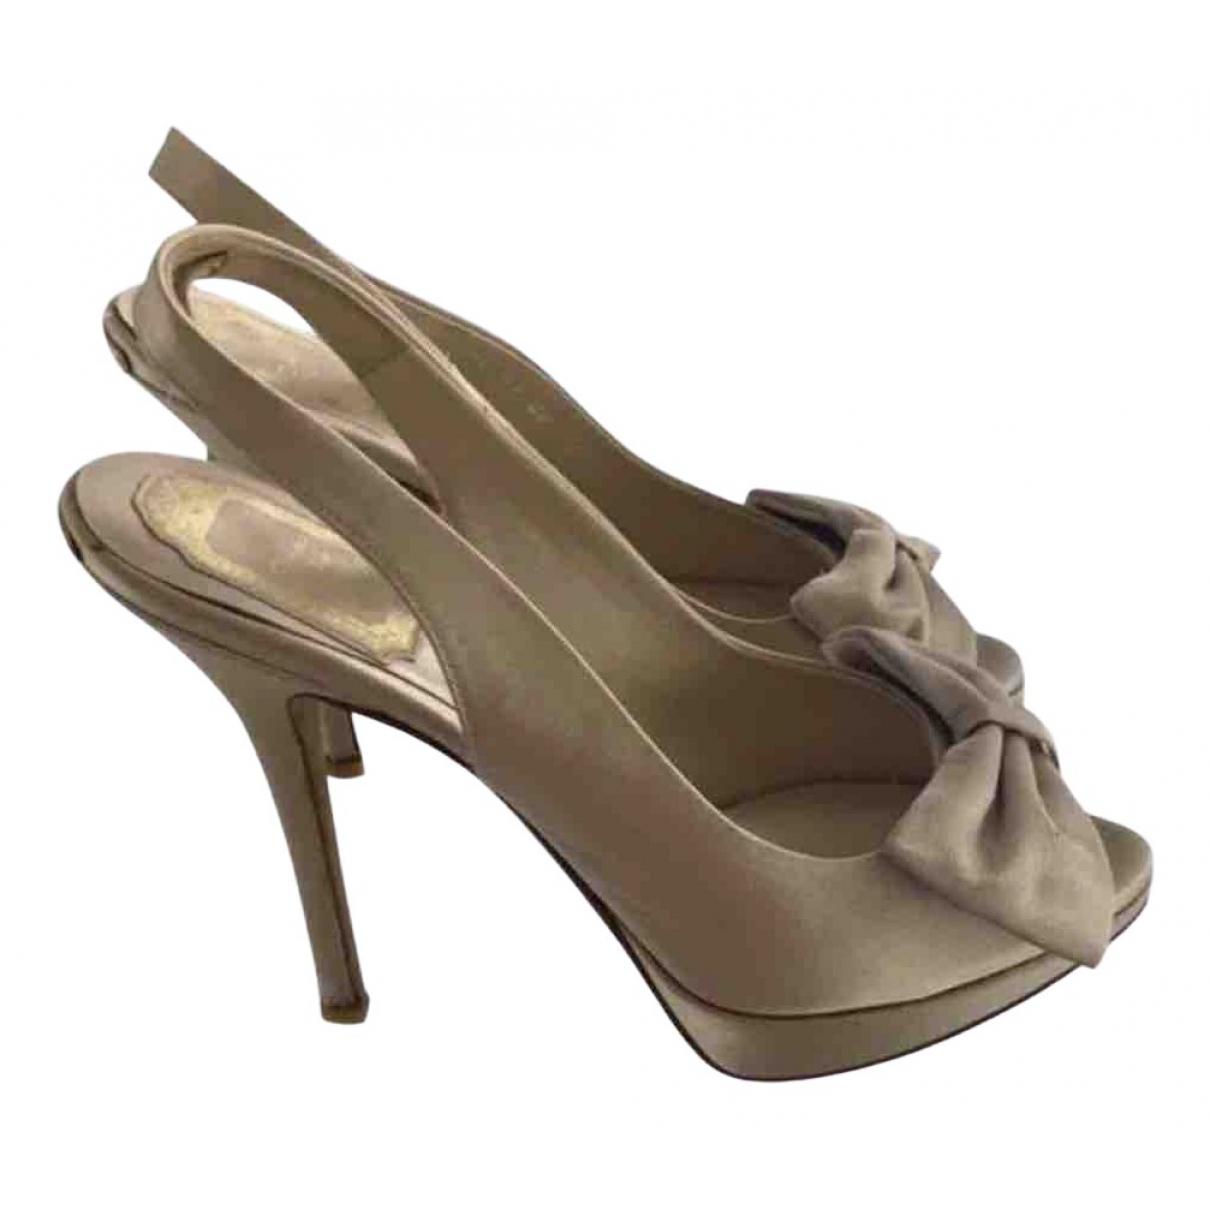 Dior \N Beige Cloth Heels for Women 36.5 IT